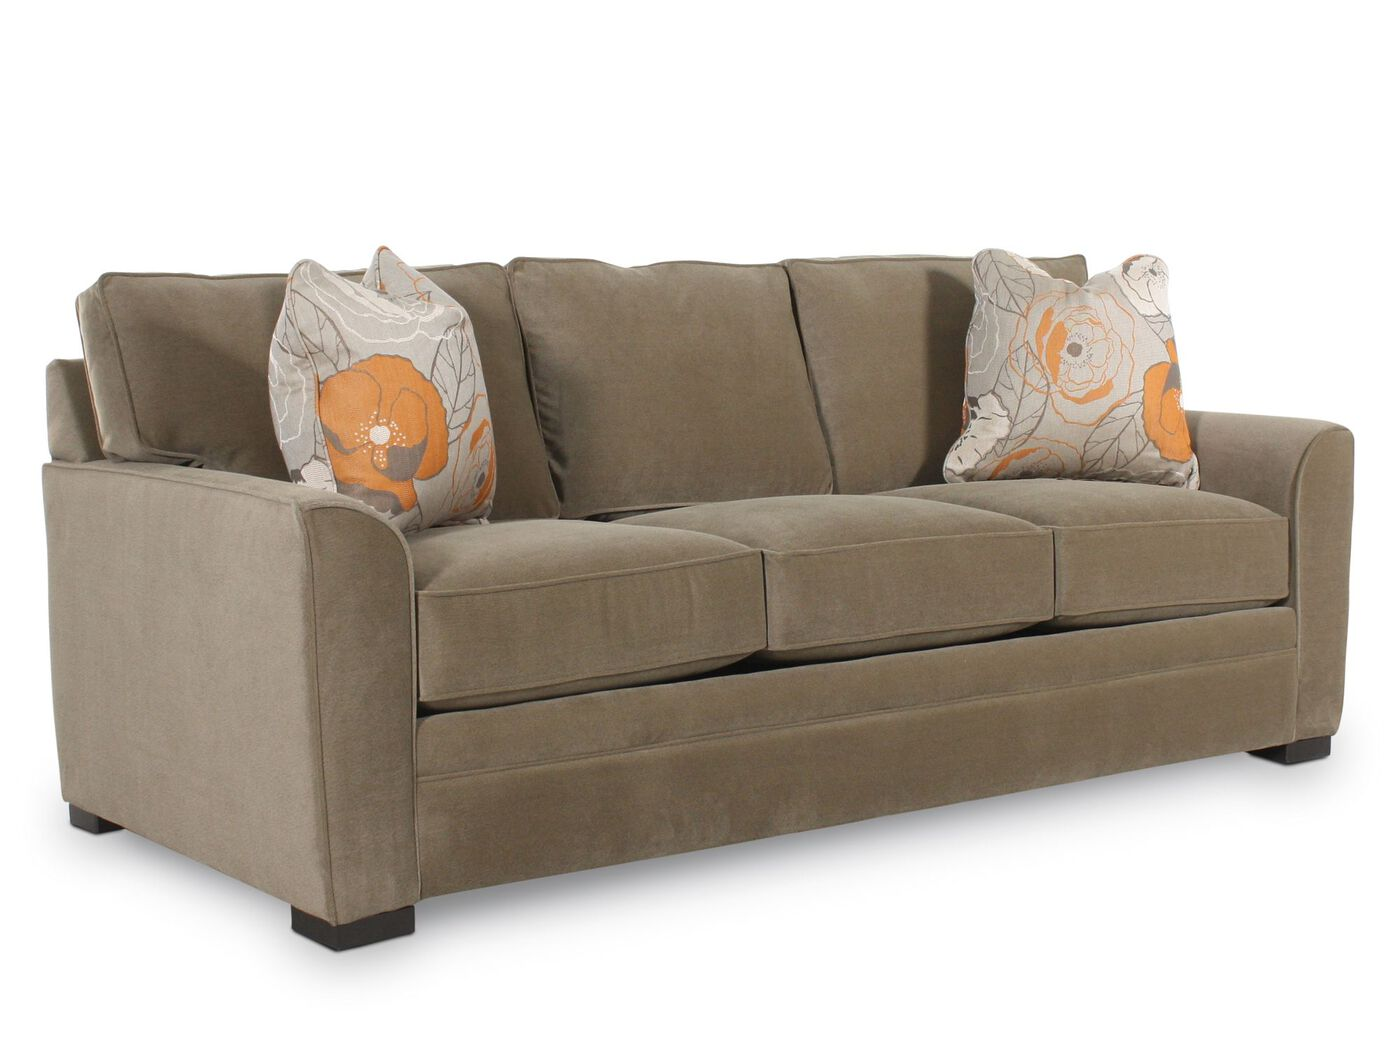 Jonathan Louis Queen Sleeper Sofa With Air Mattress | Mathis